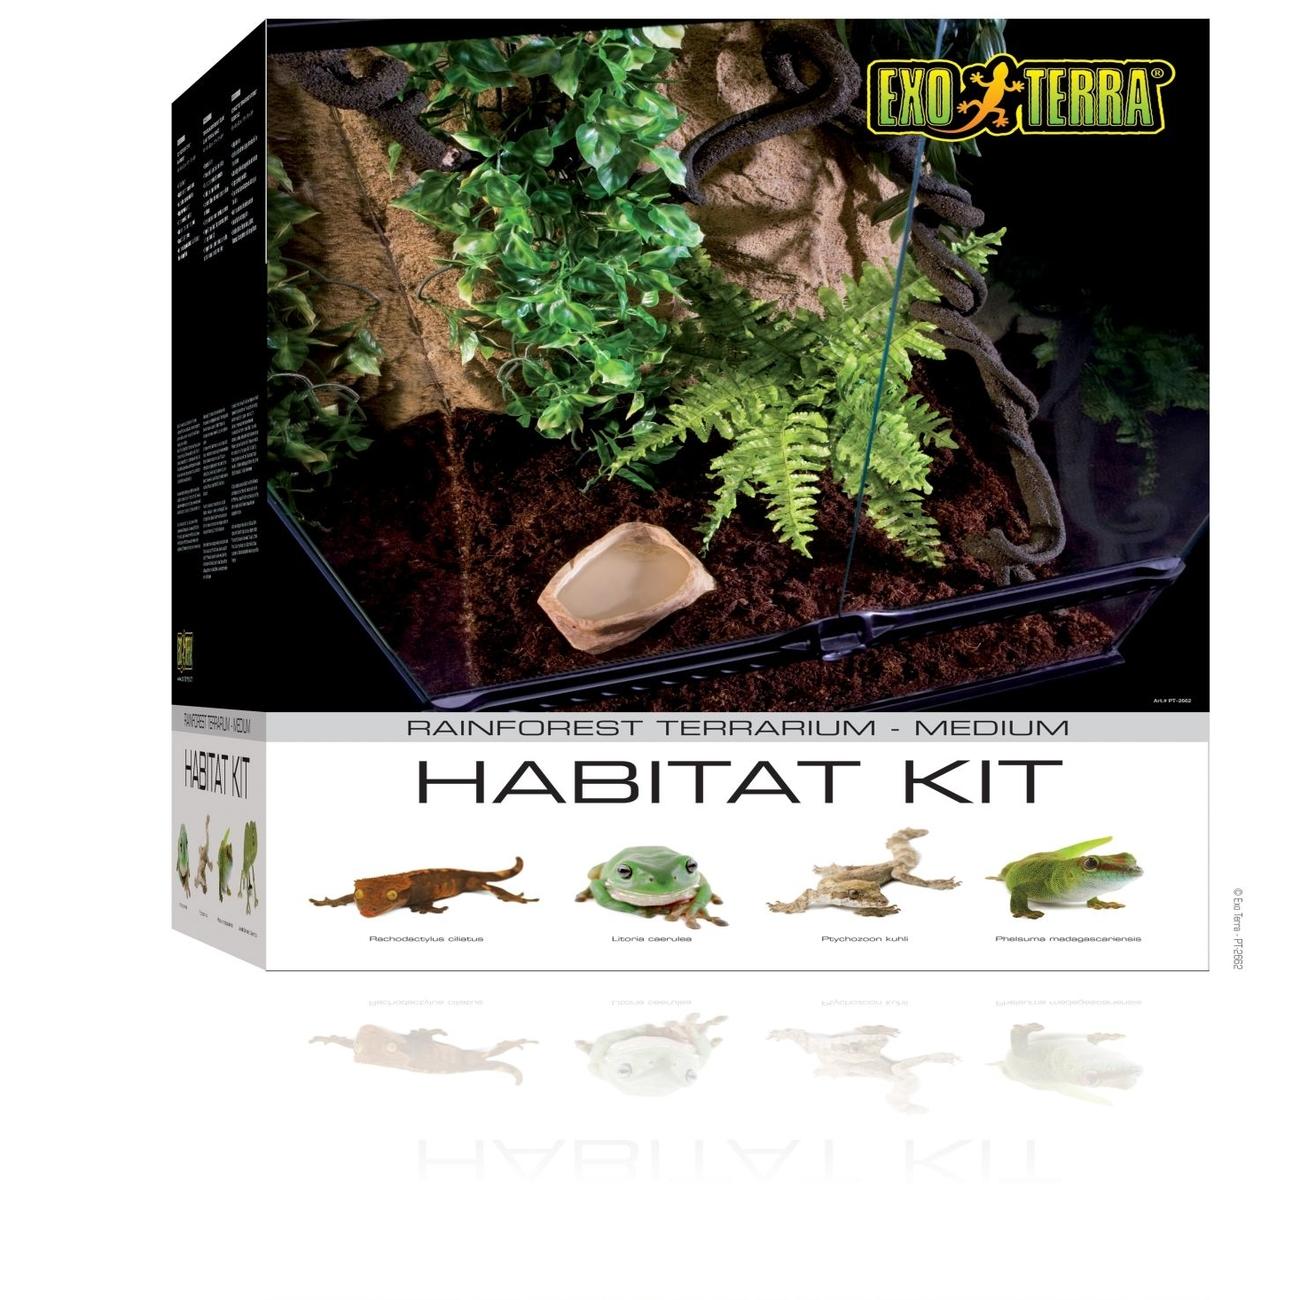 Hagen Exo Terra - Rainforest Habitat Kit, Gr. M - 45 x 60 x 45 cm